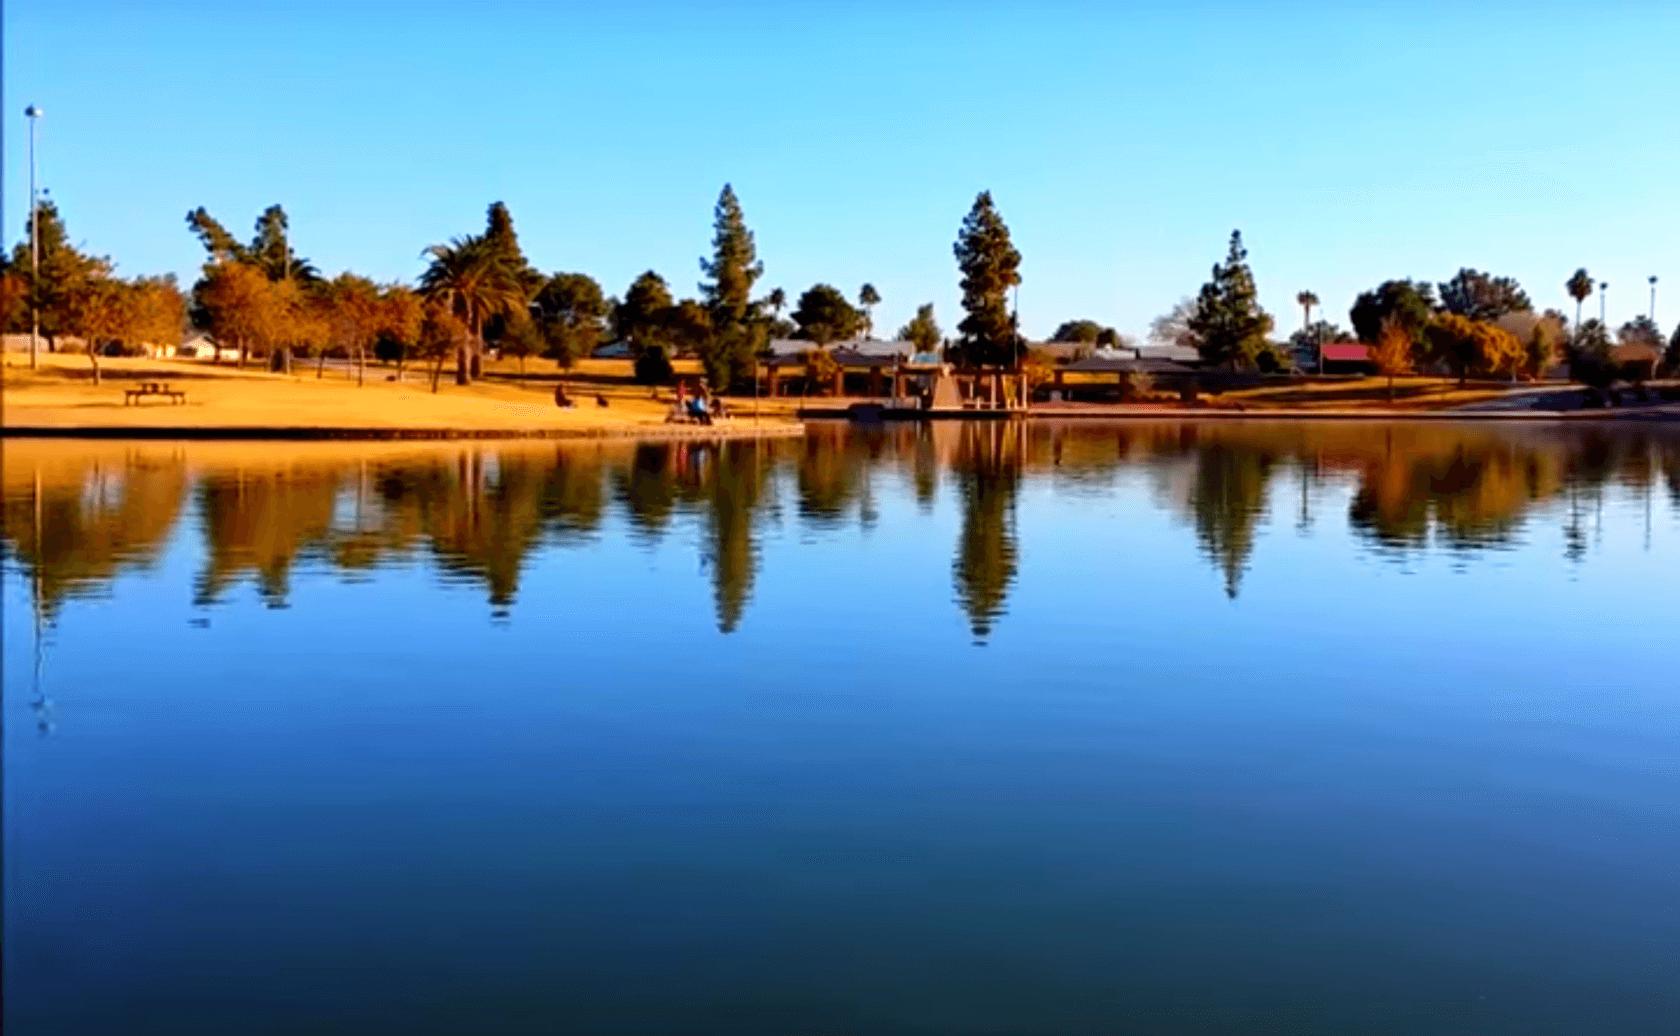 Kiwanis-Lake-Fishing-Guide-Tempe-AZ-05